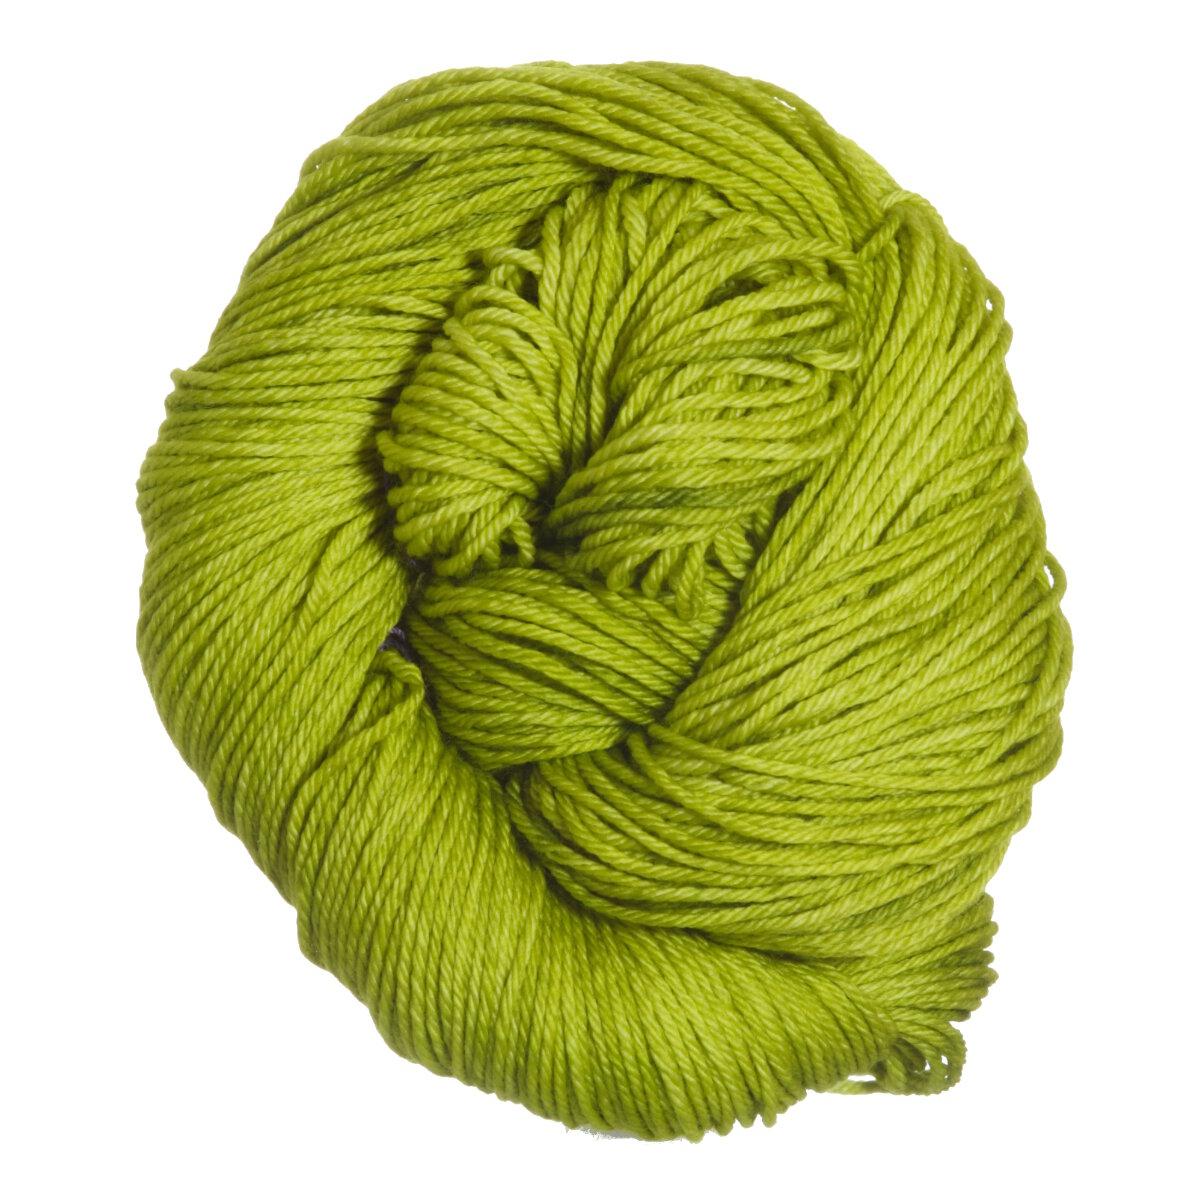 Dk Yarn : Madelinetosh Tosh DK Yarn - Grasshopper at Jimmy Beans Wool